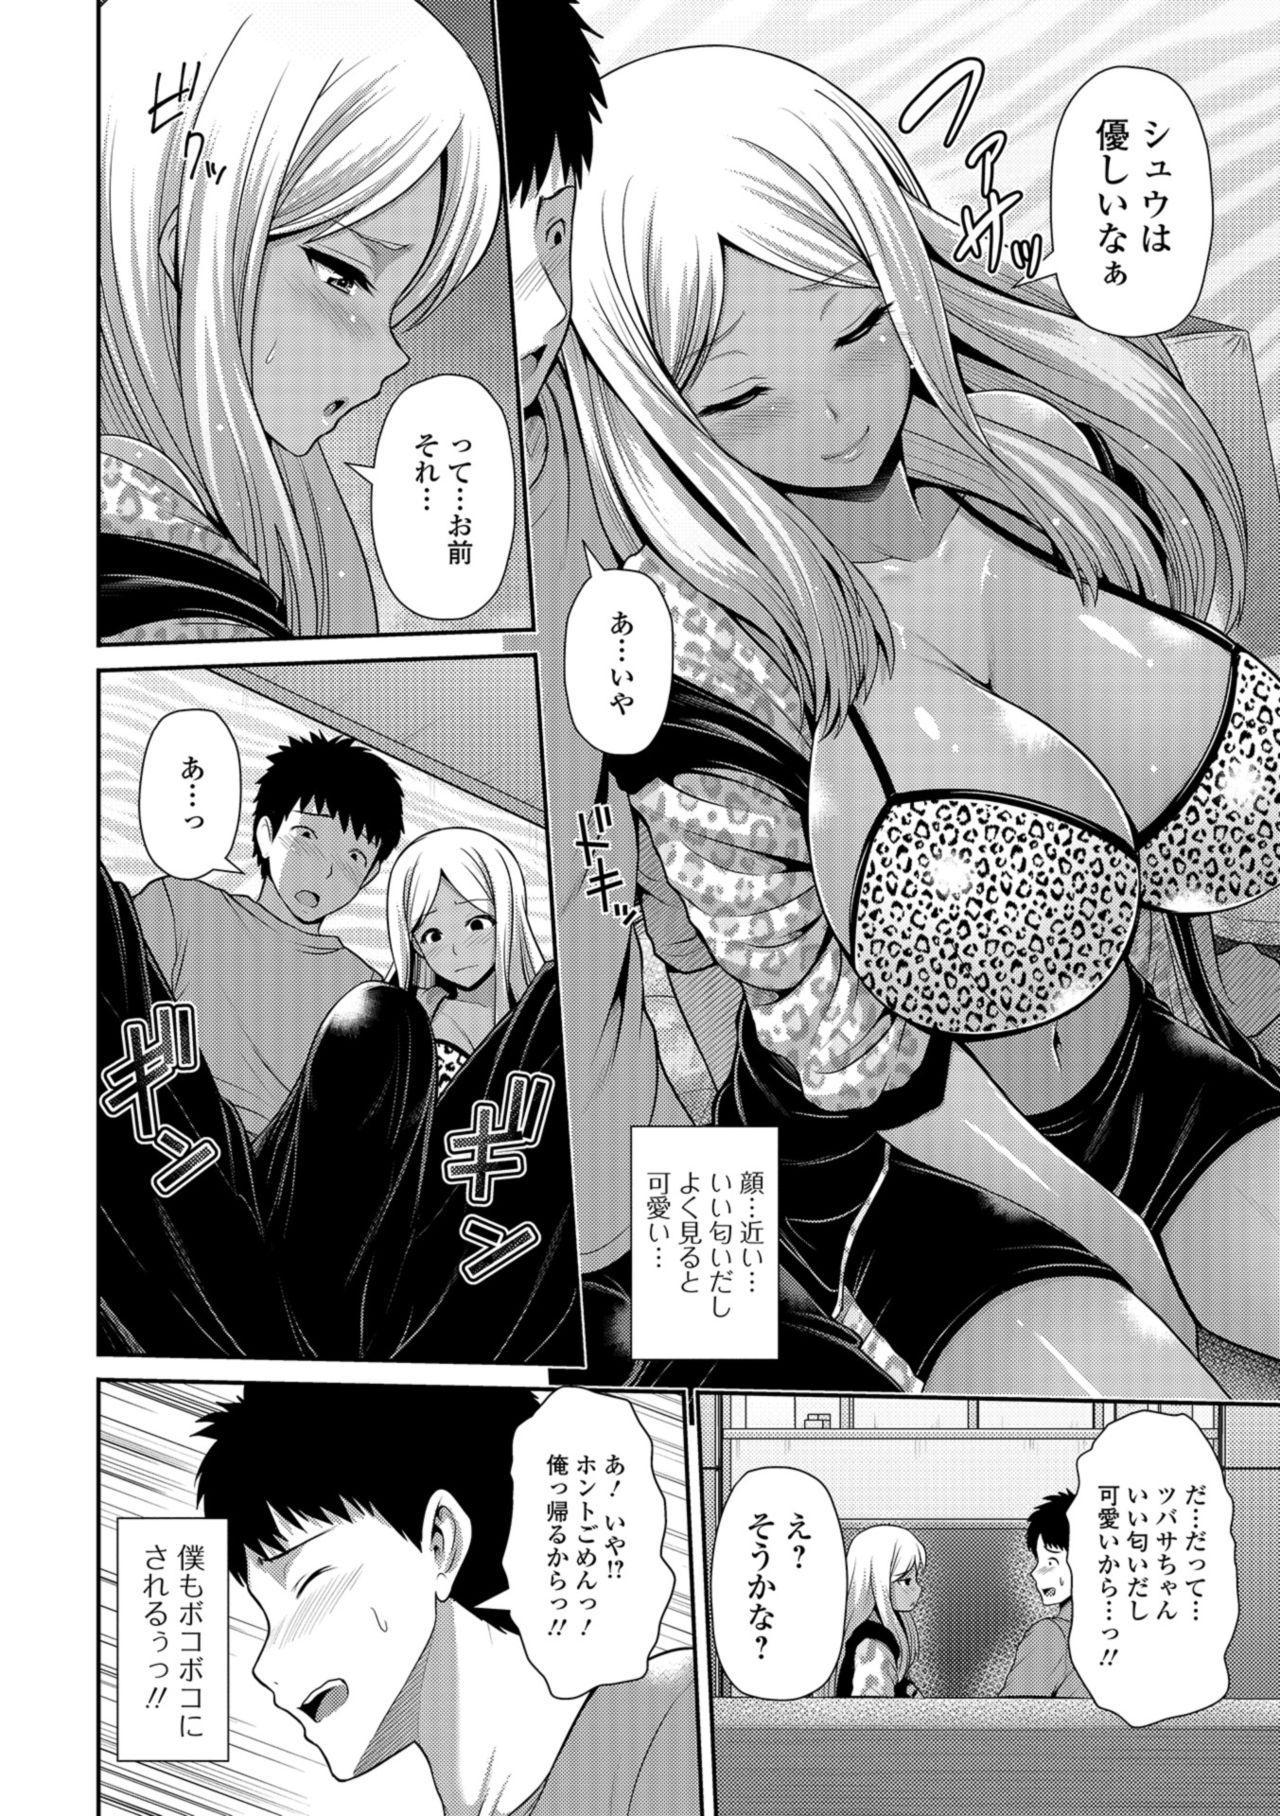 COMIC Shigekiteki SQUIRT!! Vol. 09 143